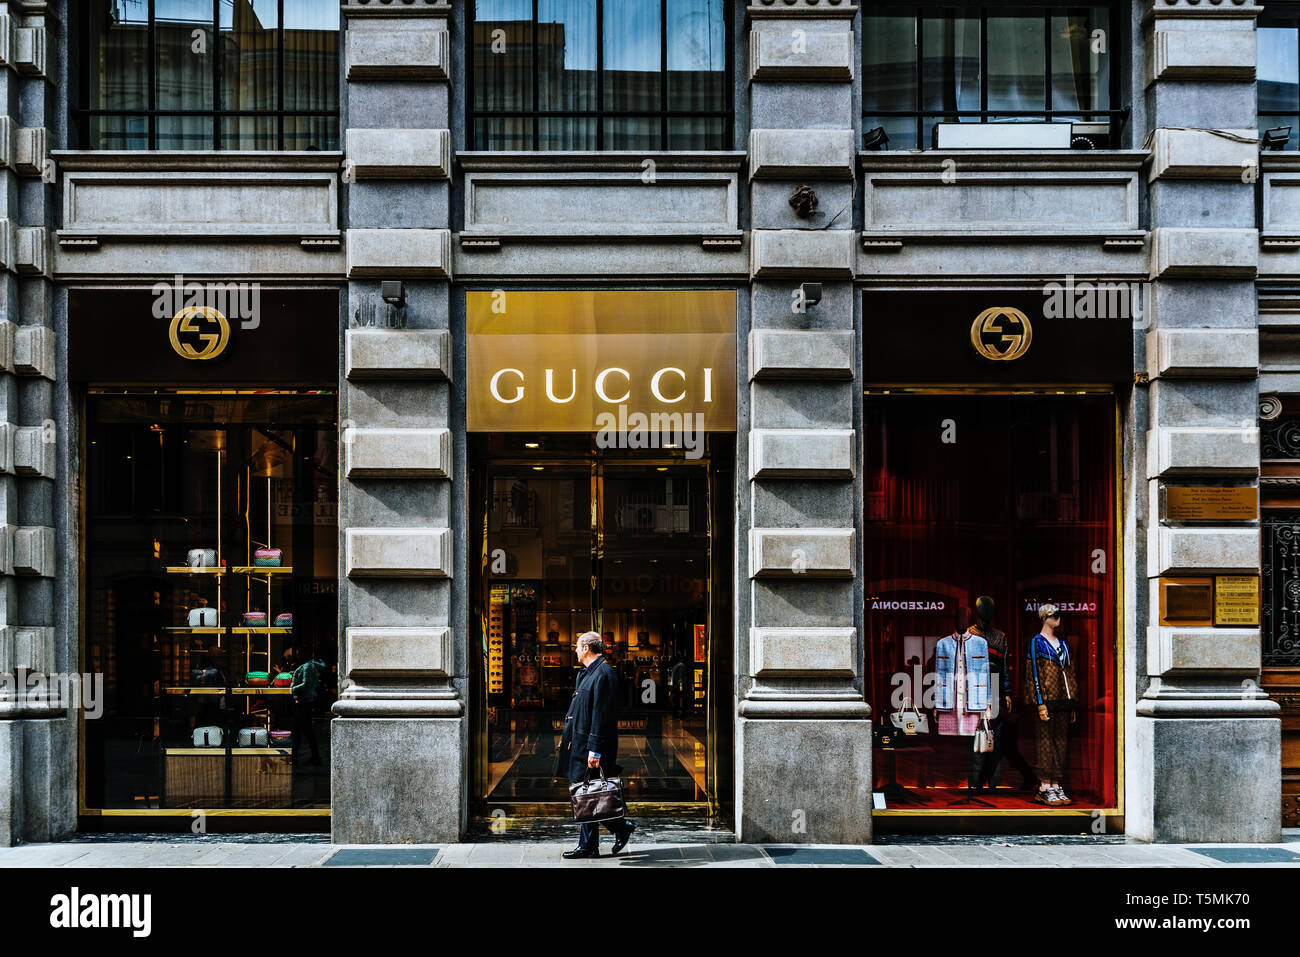 94c9b5efd40 Gucci Shop Window Stock Photos   Gucci Shop Window Stock Images - Alamy